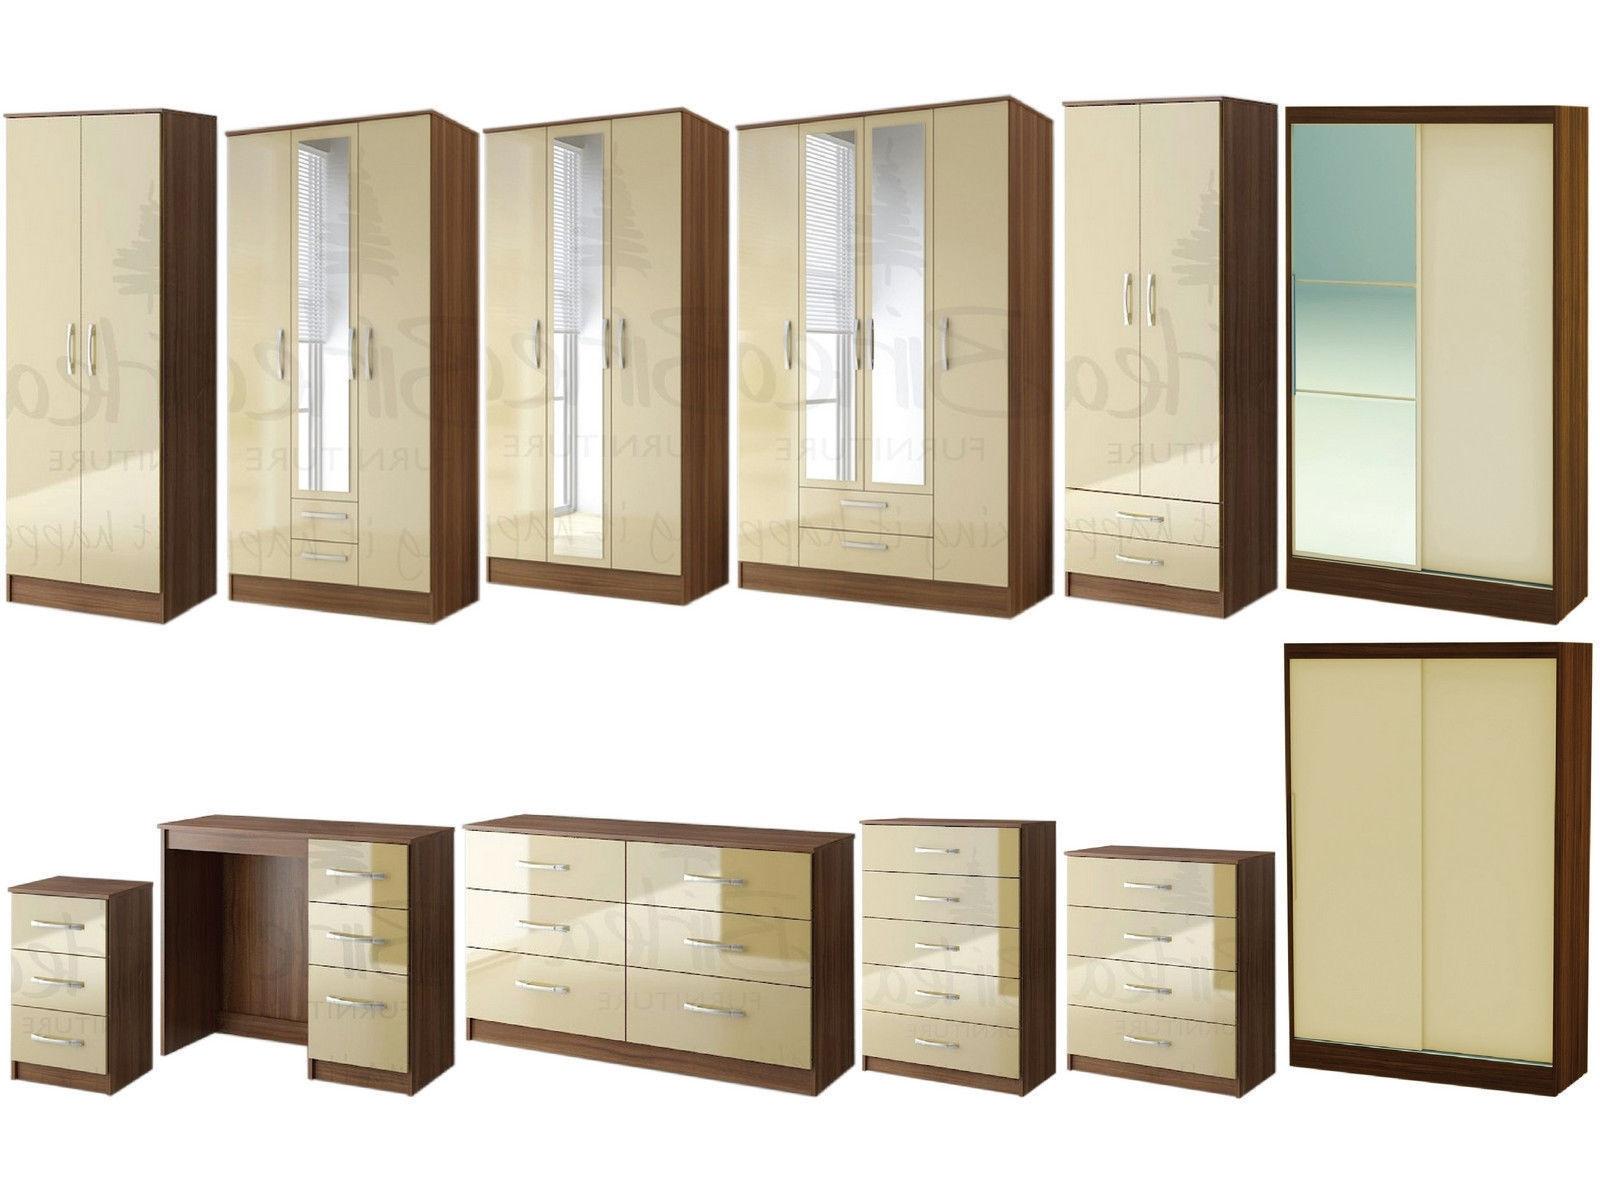 Lynx Walnut Cream Gloss Bedroom Furniture Wardrobe Chestbirlea Within Well Known Walnut Wardrobes (View 5 of 15)